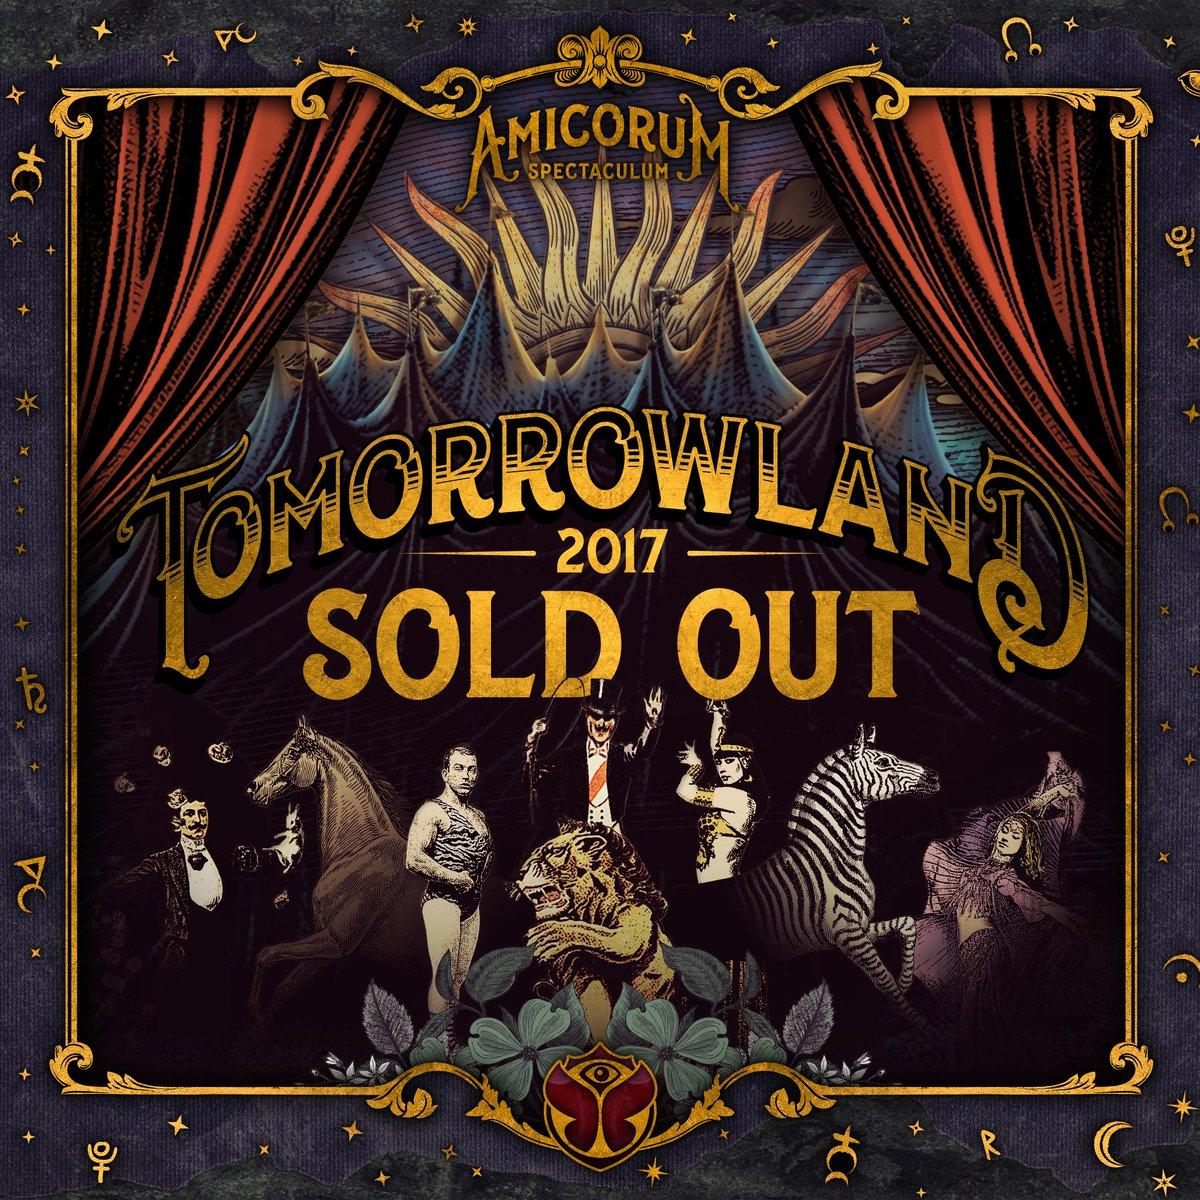 Tomorrowland Tomorrowland Twitter